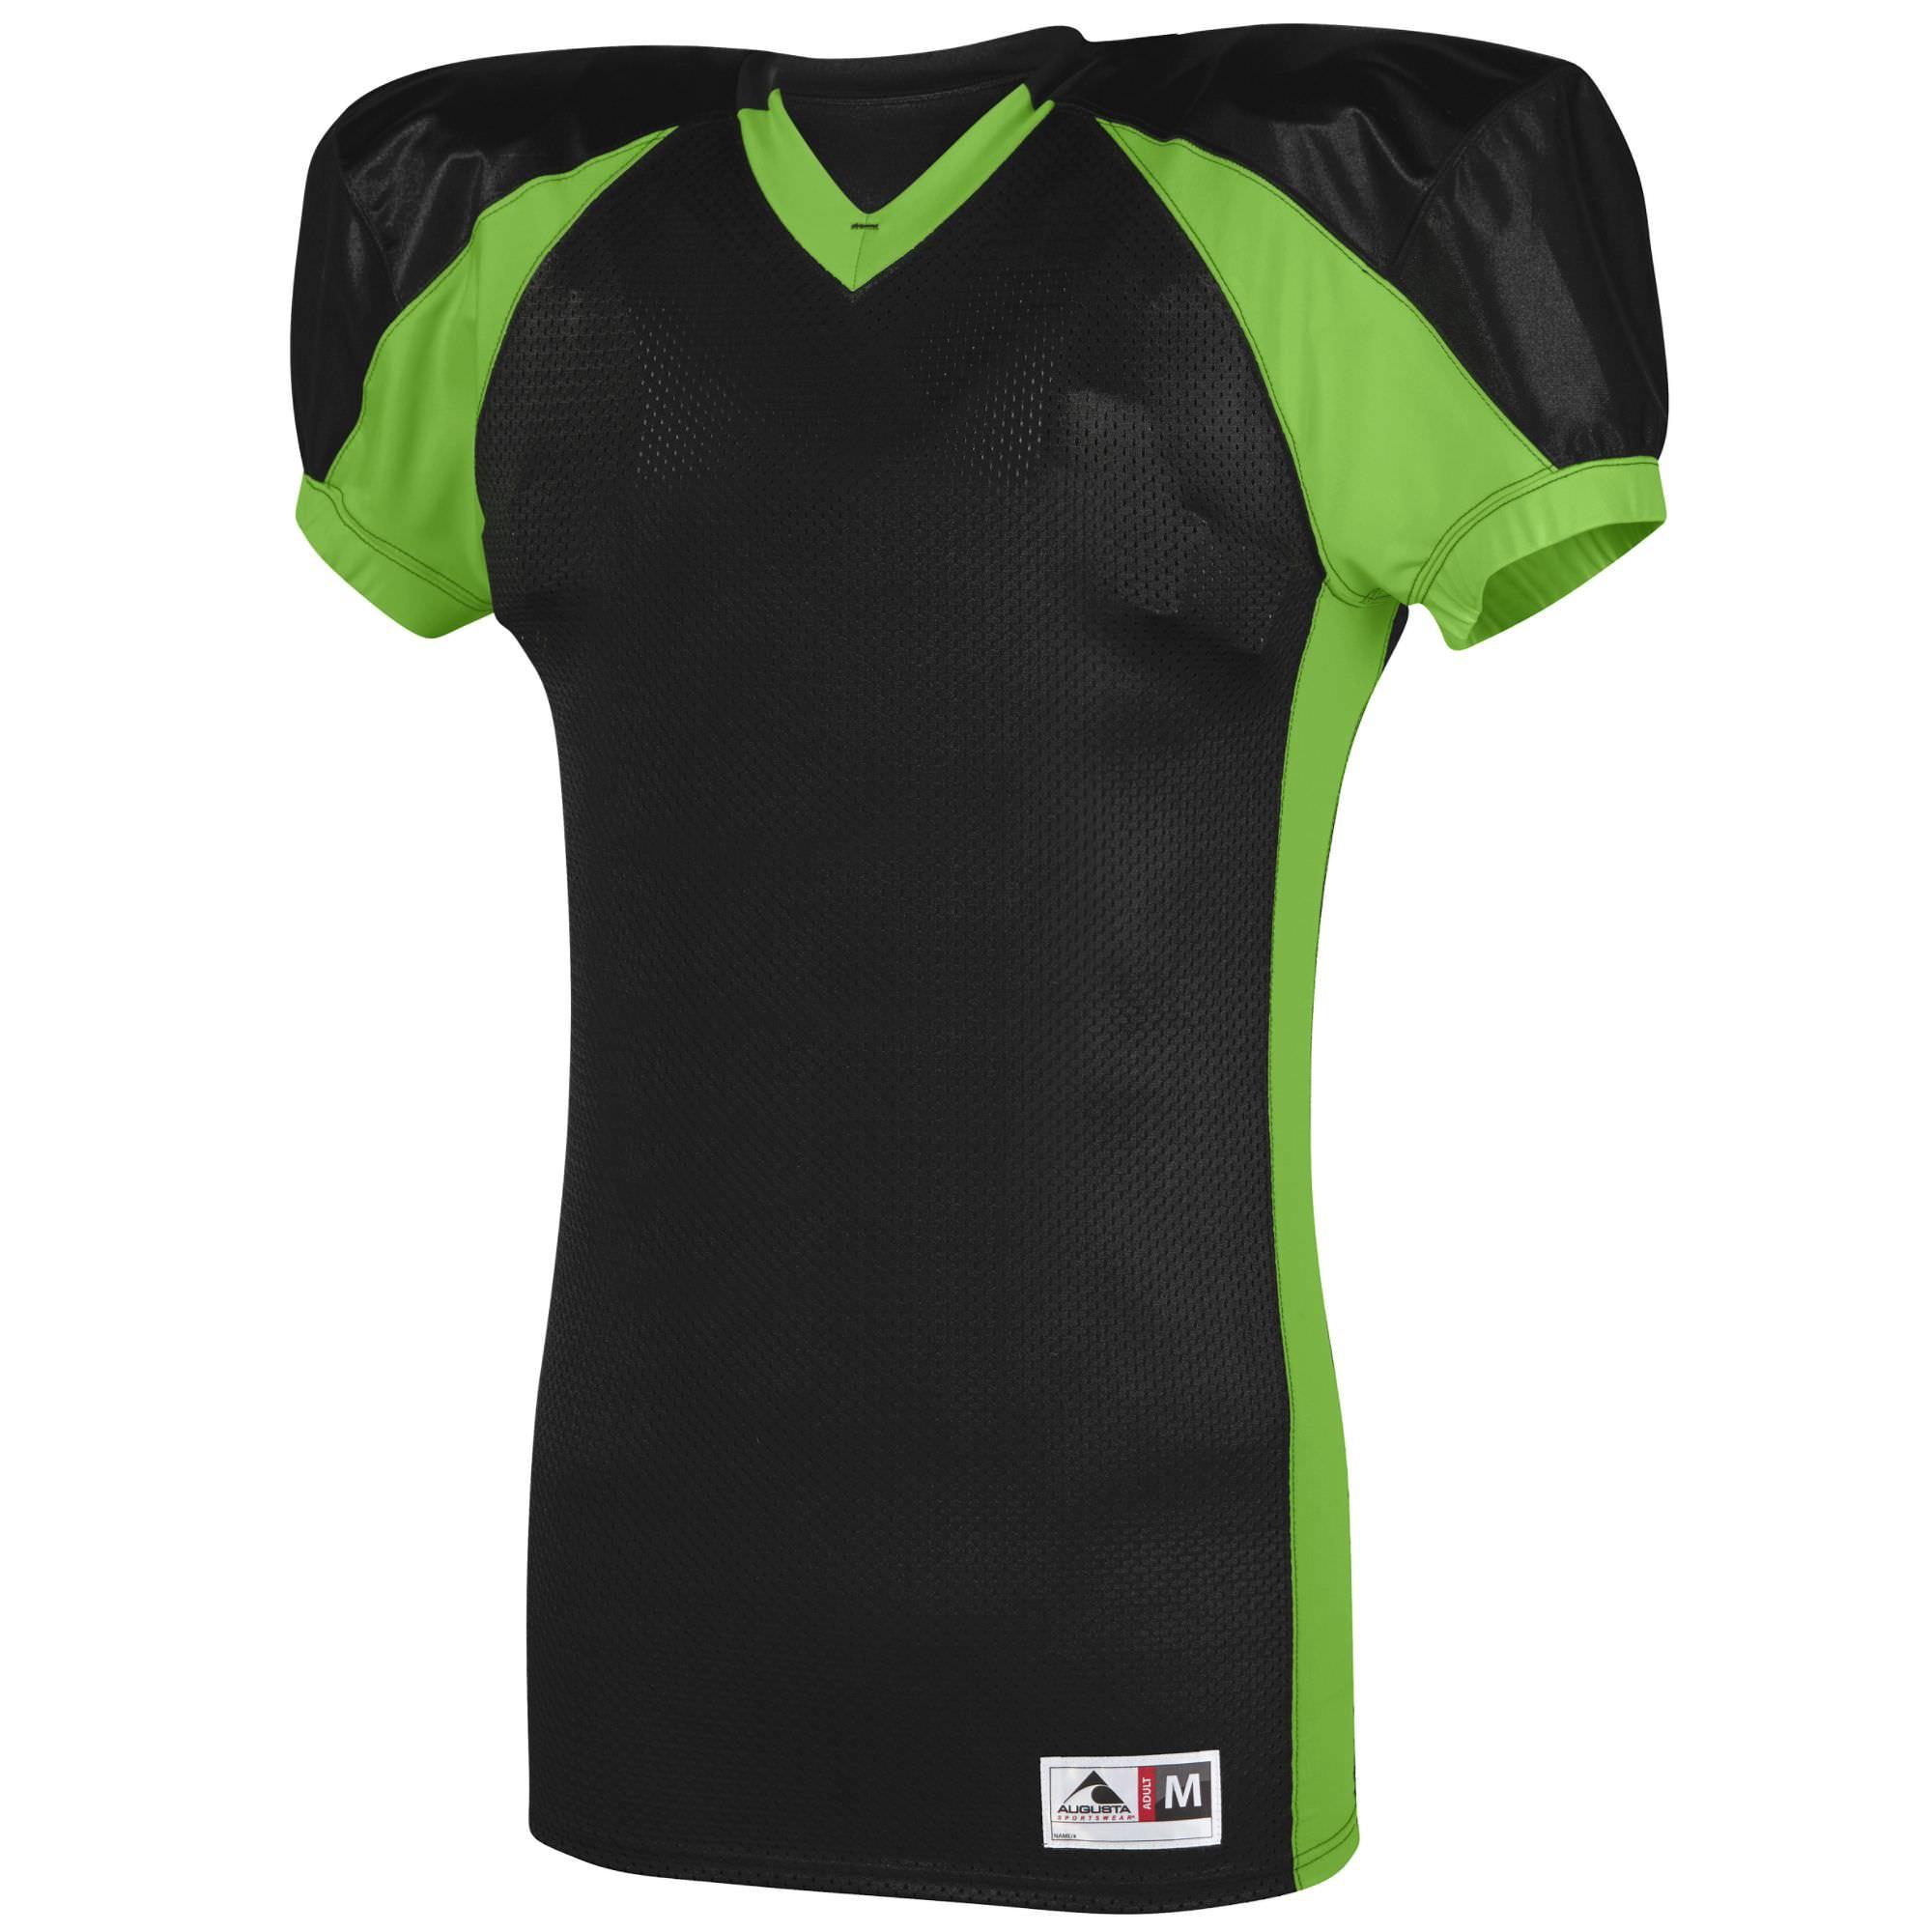 c1afb2e3fda Men's Short Sleeve Athletic Tops from Augusta Sportswear